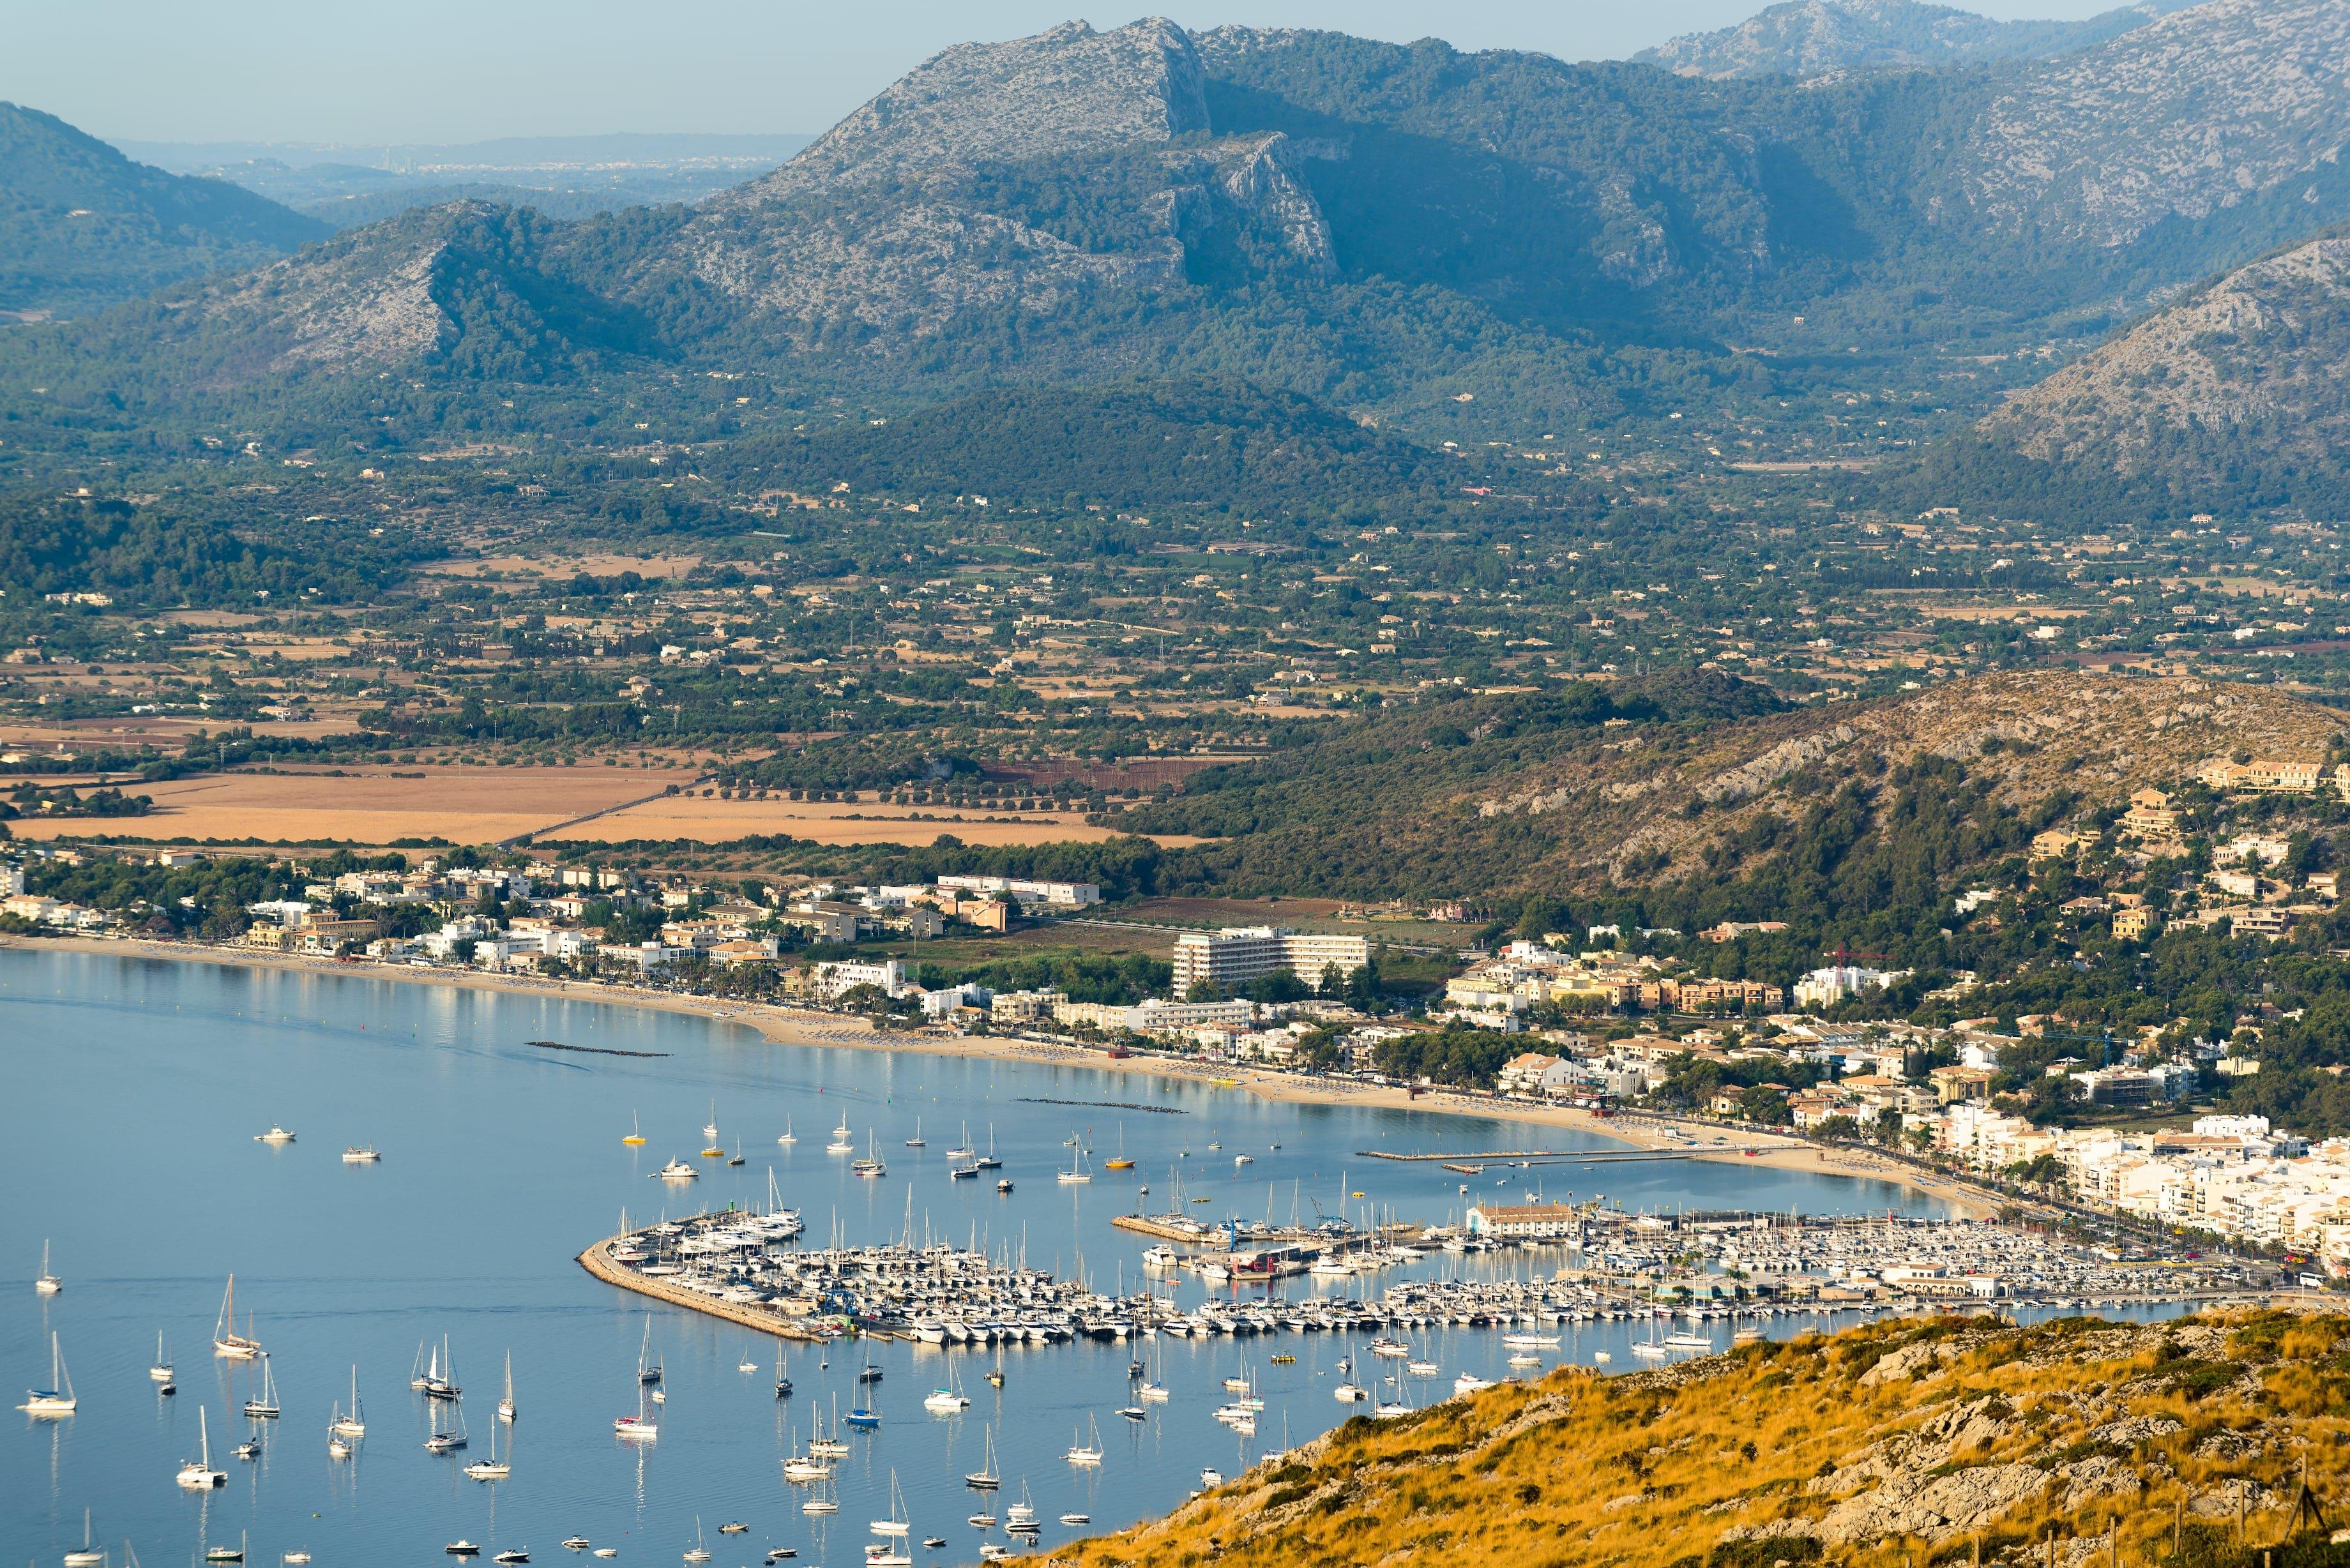 Another perfect destination – Port de Pollensa